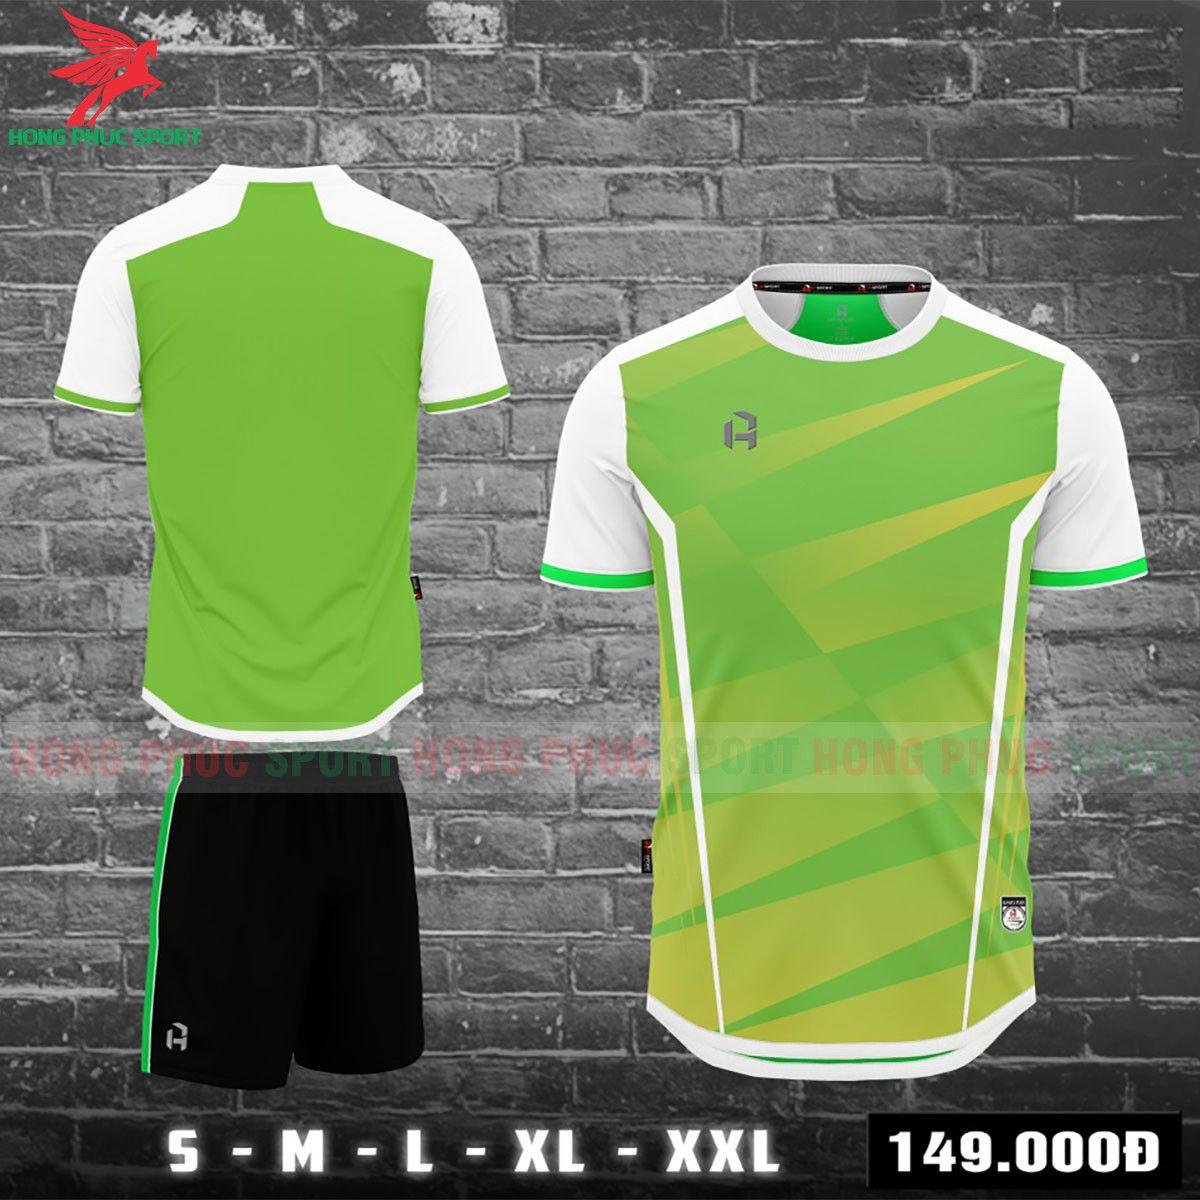 https://cdn.hongphucsport.com/unsafe/s4.shopbay.vn/files/285/ao-bong-da-khong-logo-hp-sport-2021-bebotux-xanh-la-60f5310707191.jpg